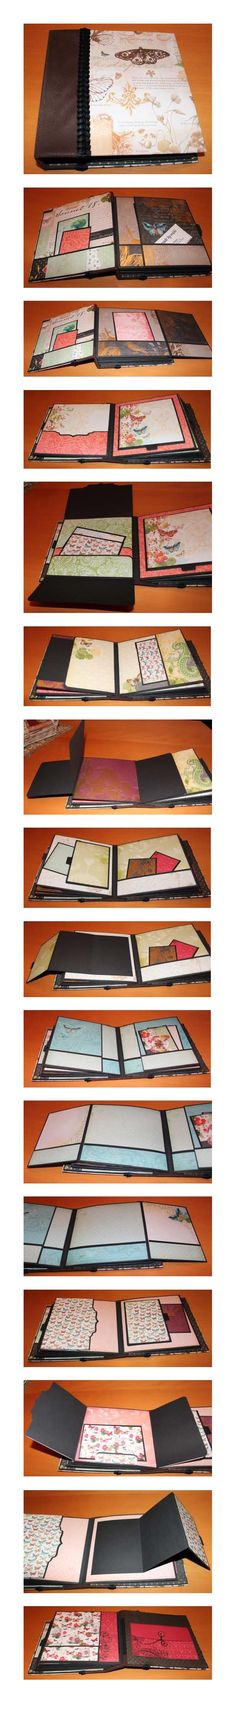 8x8 mini album - using DCWV Mariposa stack